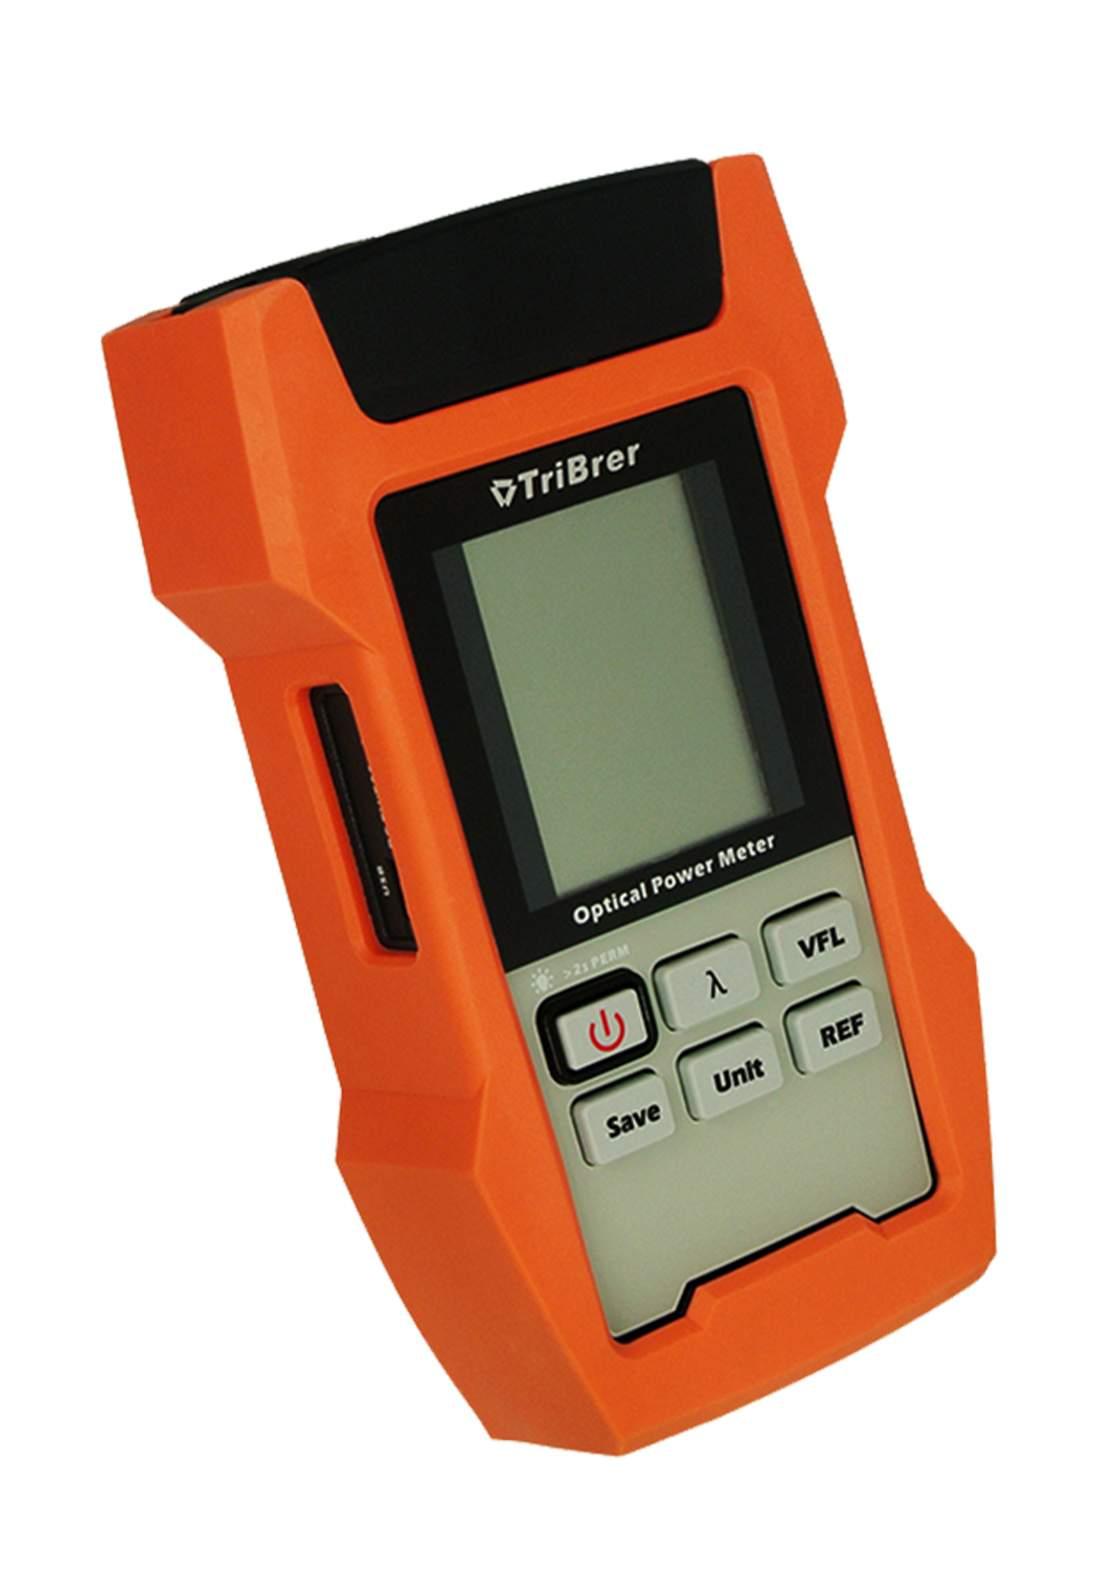 TriBrer AOP100 Optical Power Meter - Orange مقياس طاقة الألياف الضوئية